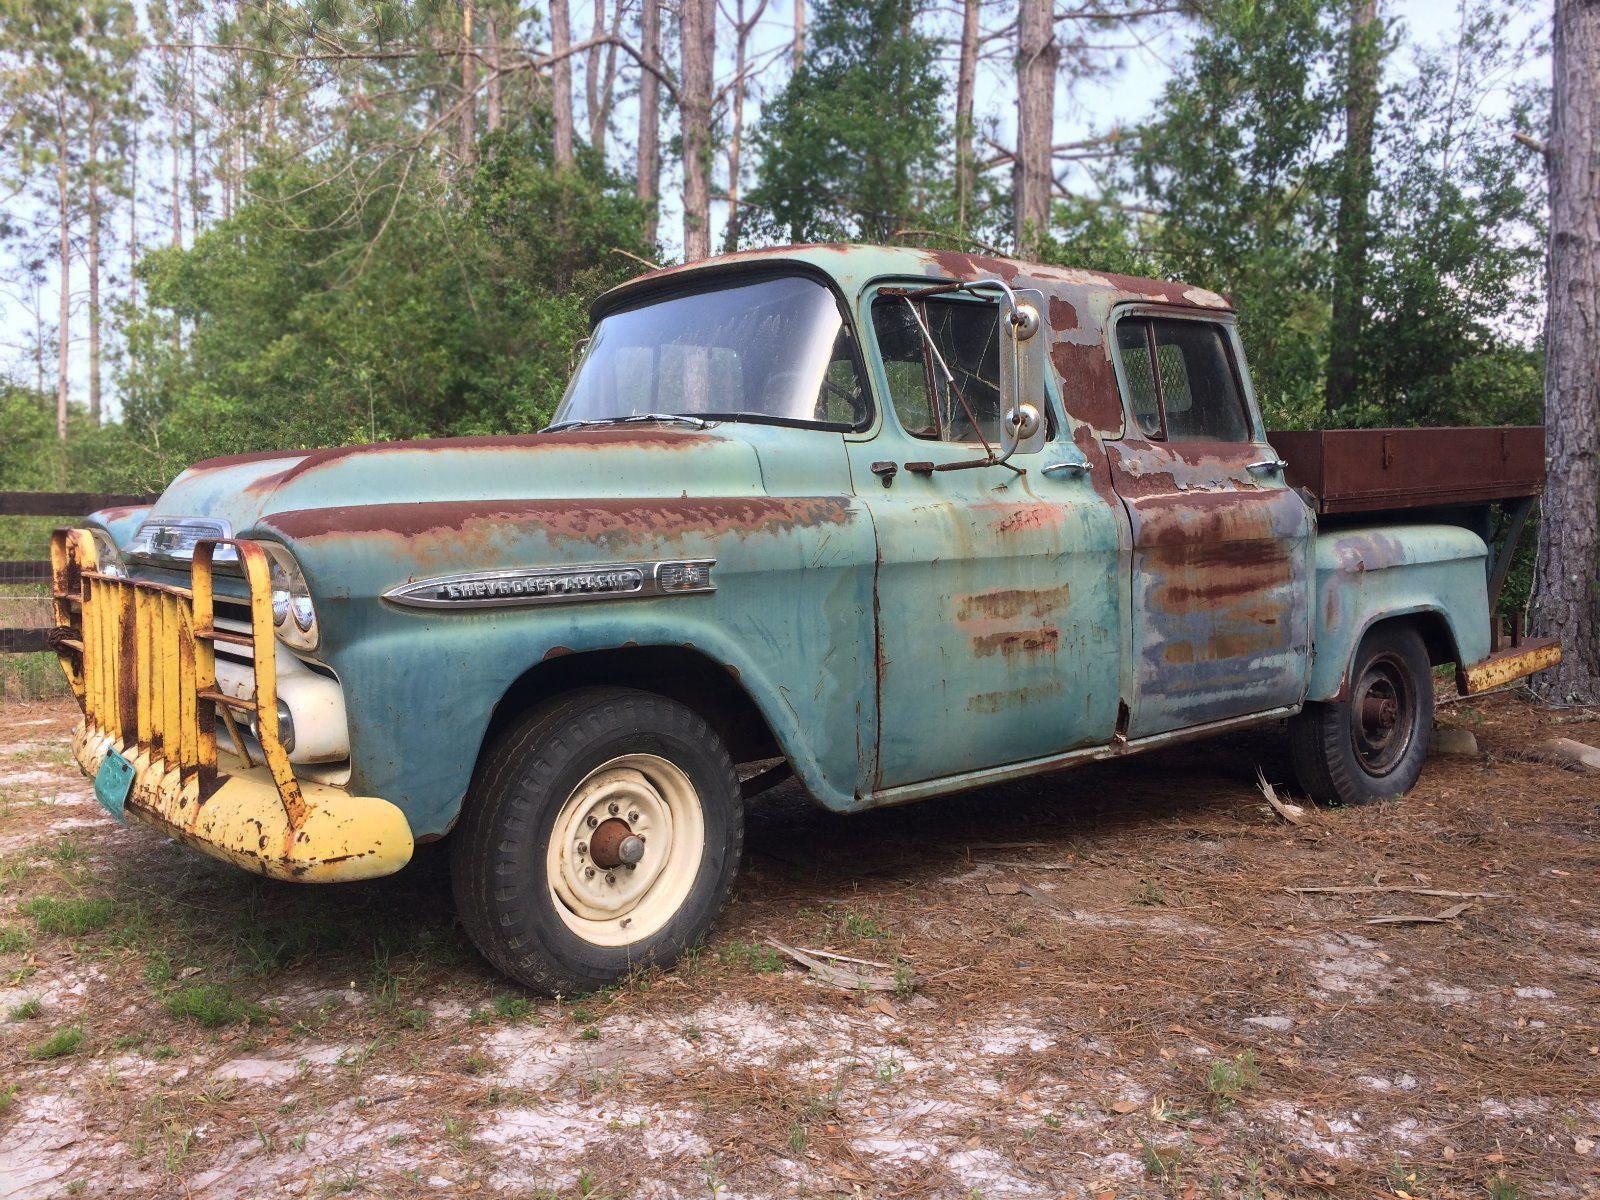 1957 Chevy Pickup Ebay Crew Cab Linked1957 Truck Ebay1956 Ebayamerican Ebayvintage Searcy Ar Bobbittvilleitems In Classicparts4u Store On